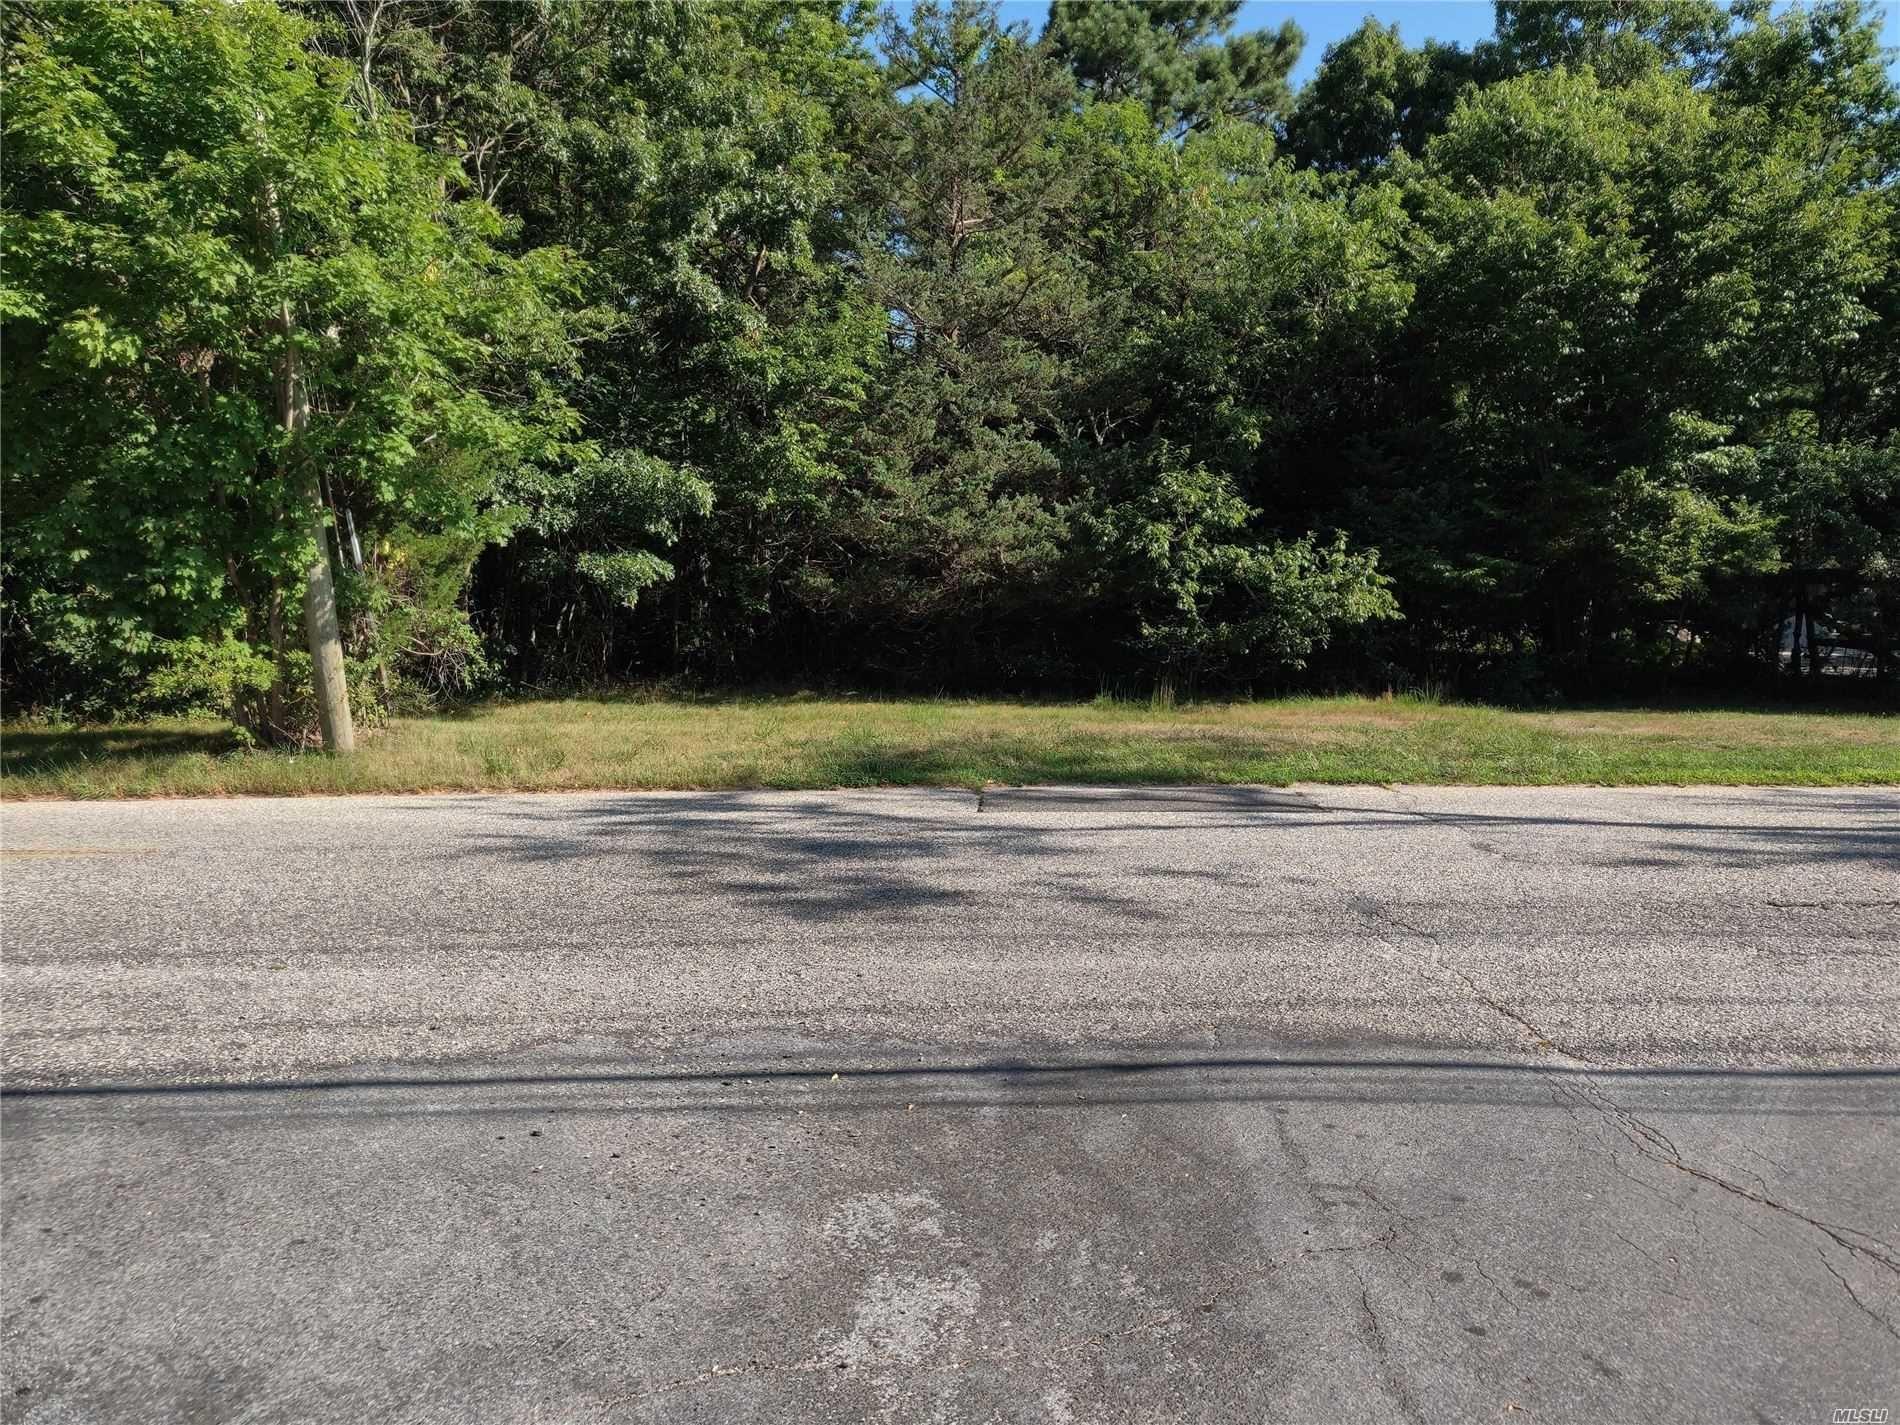 Lot 1 Barton Ave, Patchogue, NY 11772 - MLS#: 3237711